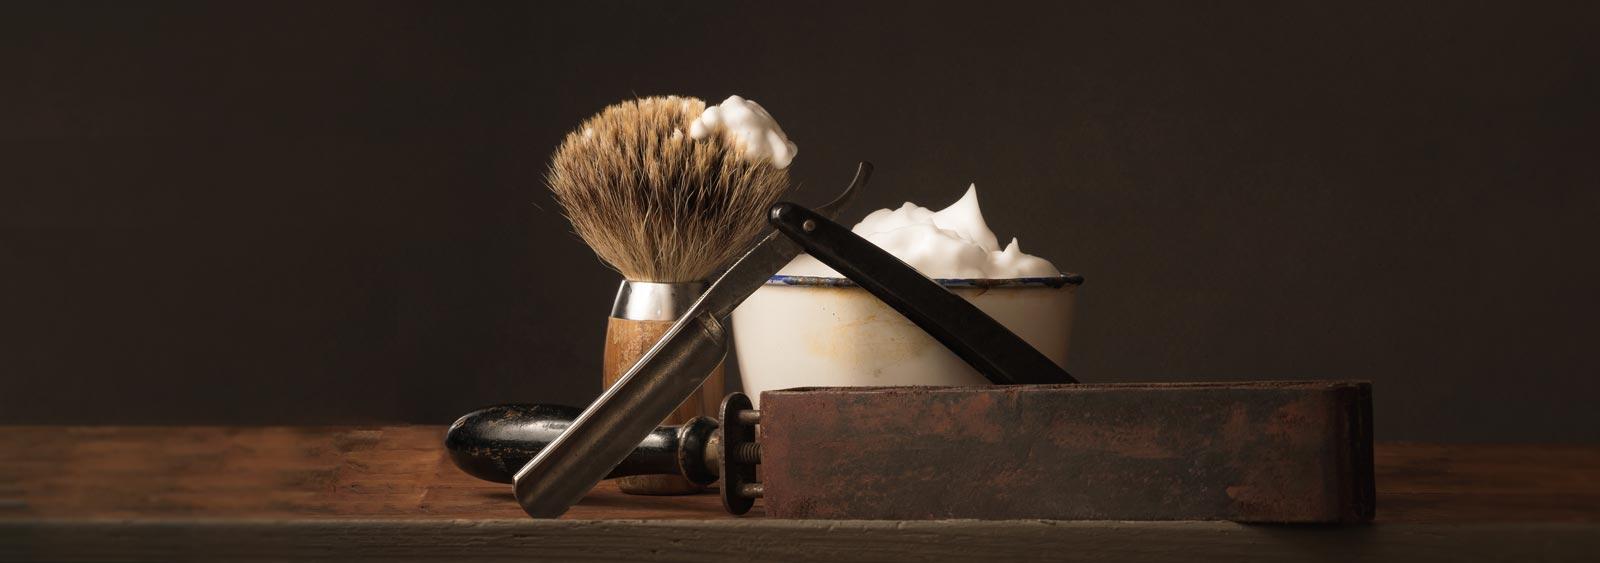 Traditional Razor and Shaving Tools At Parramatta Barbershop